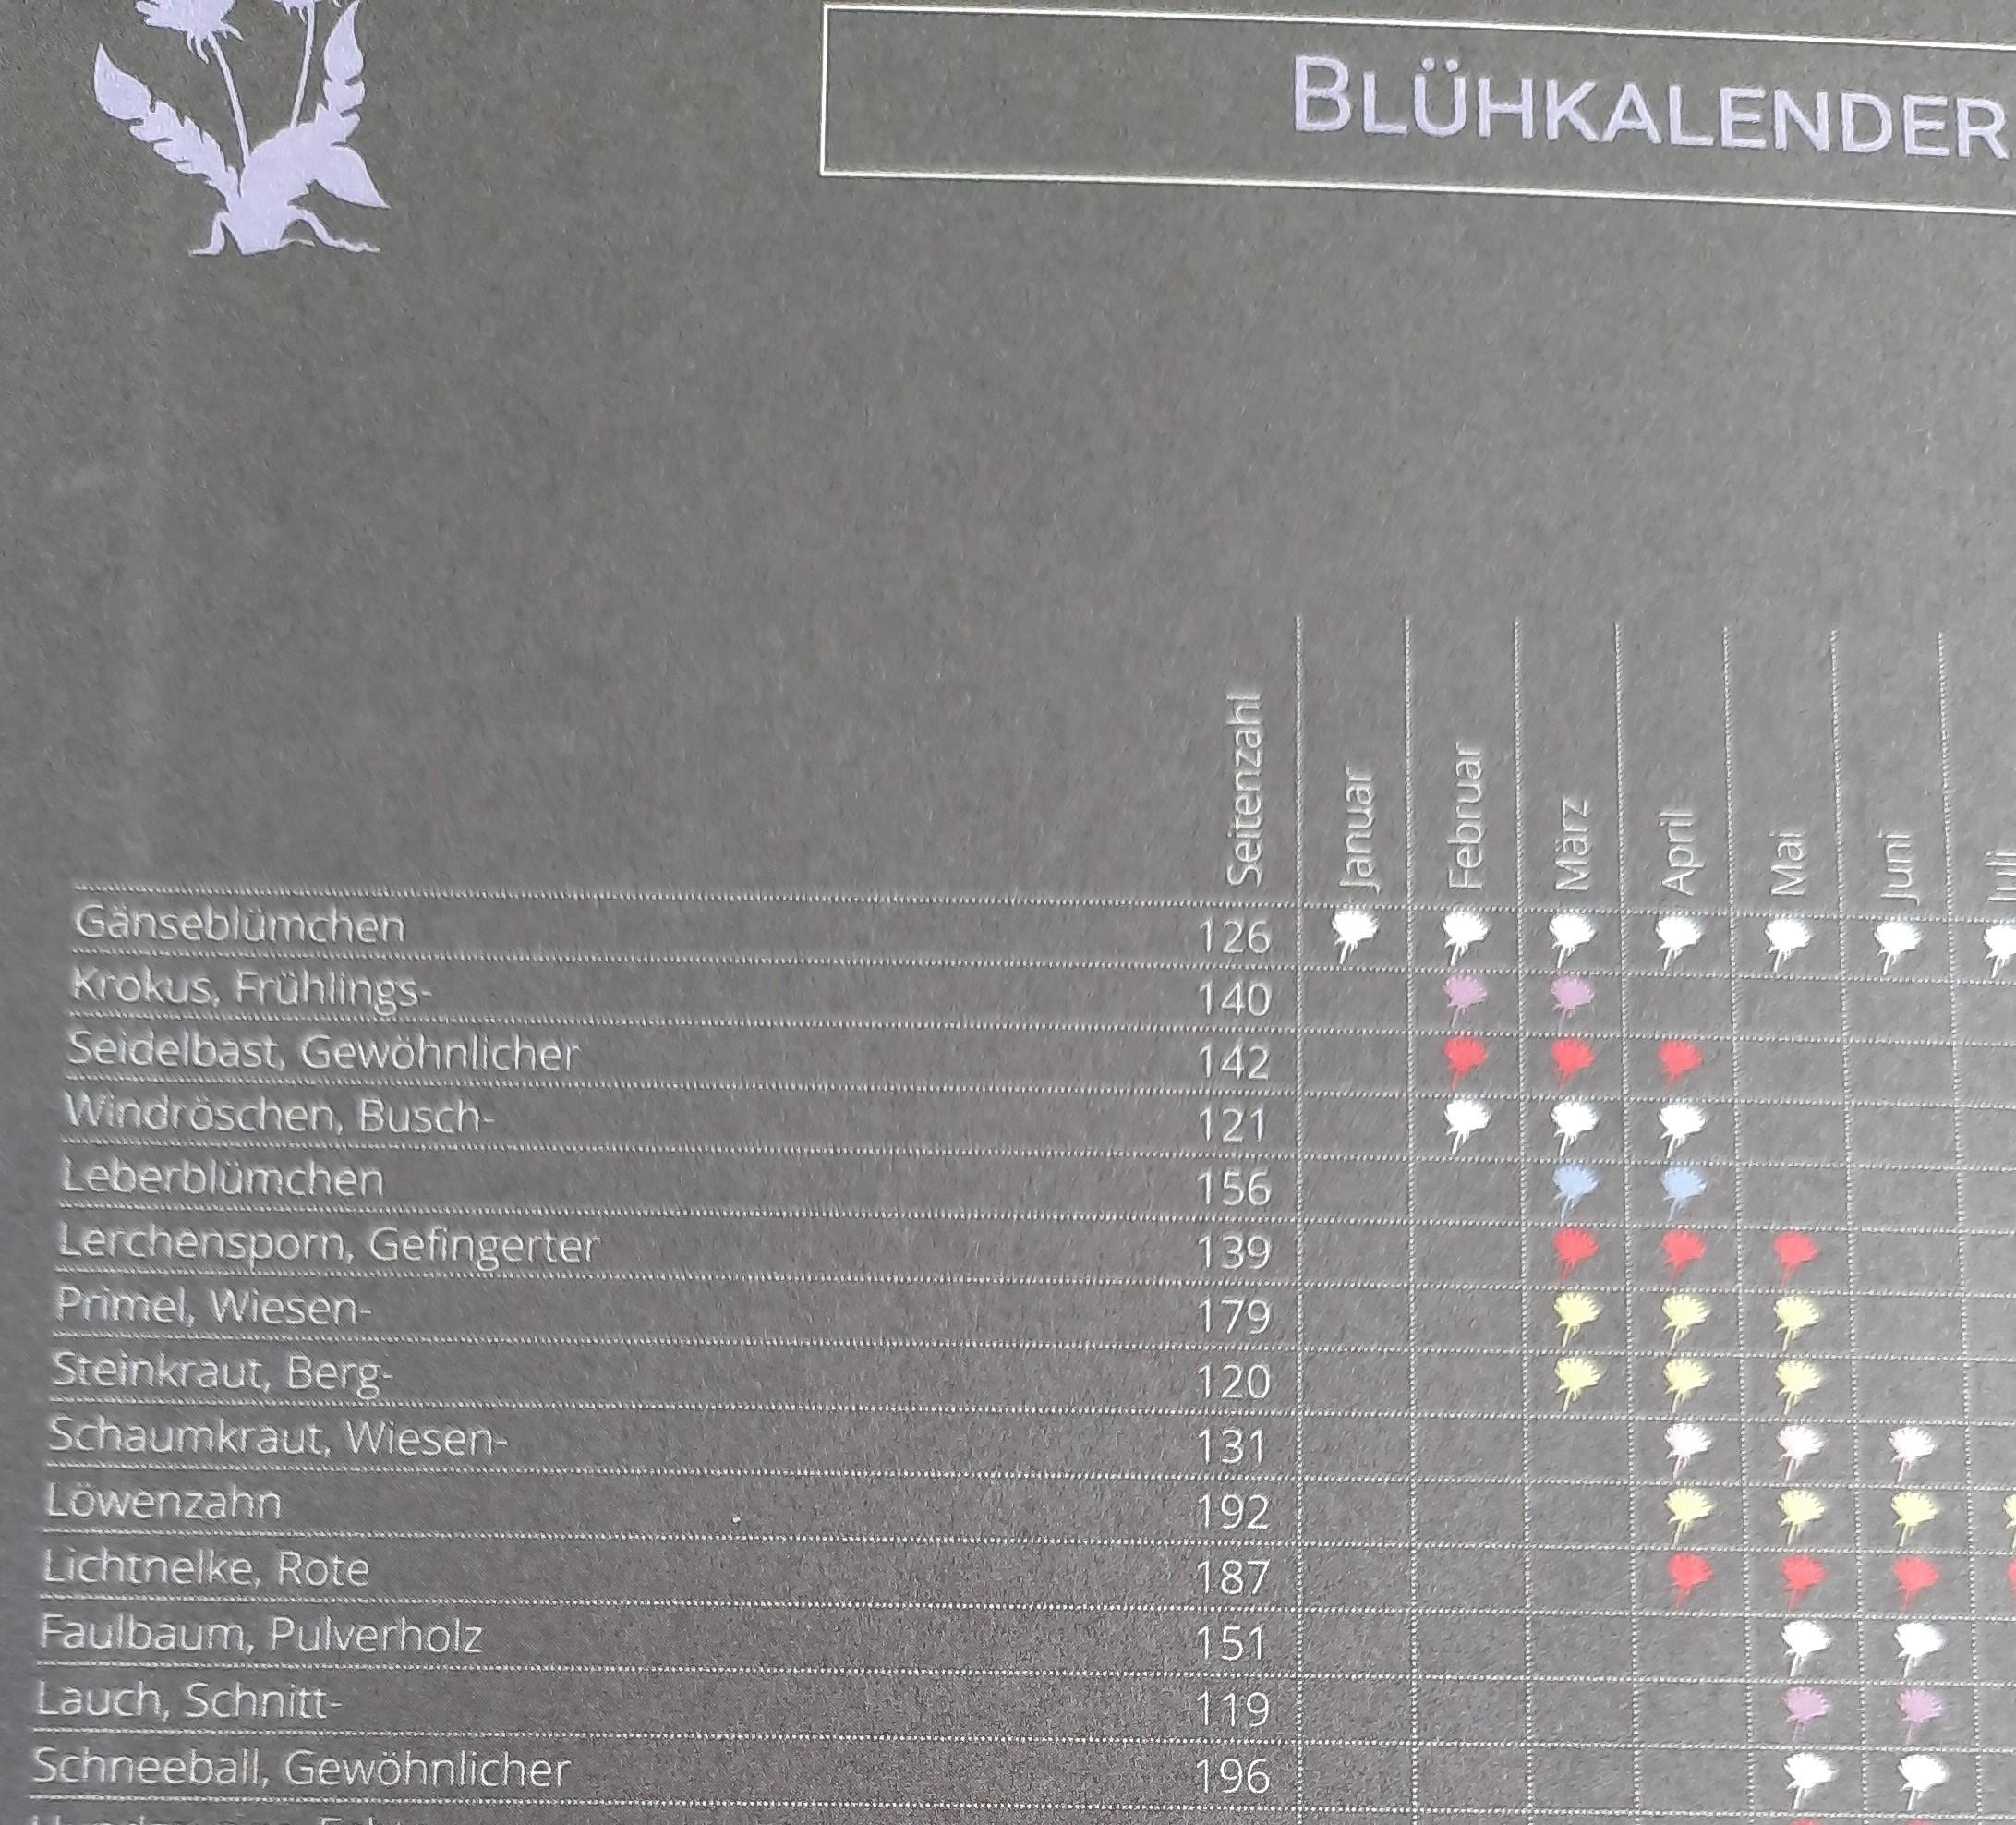 Blühkalender